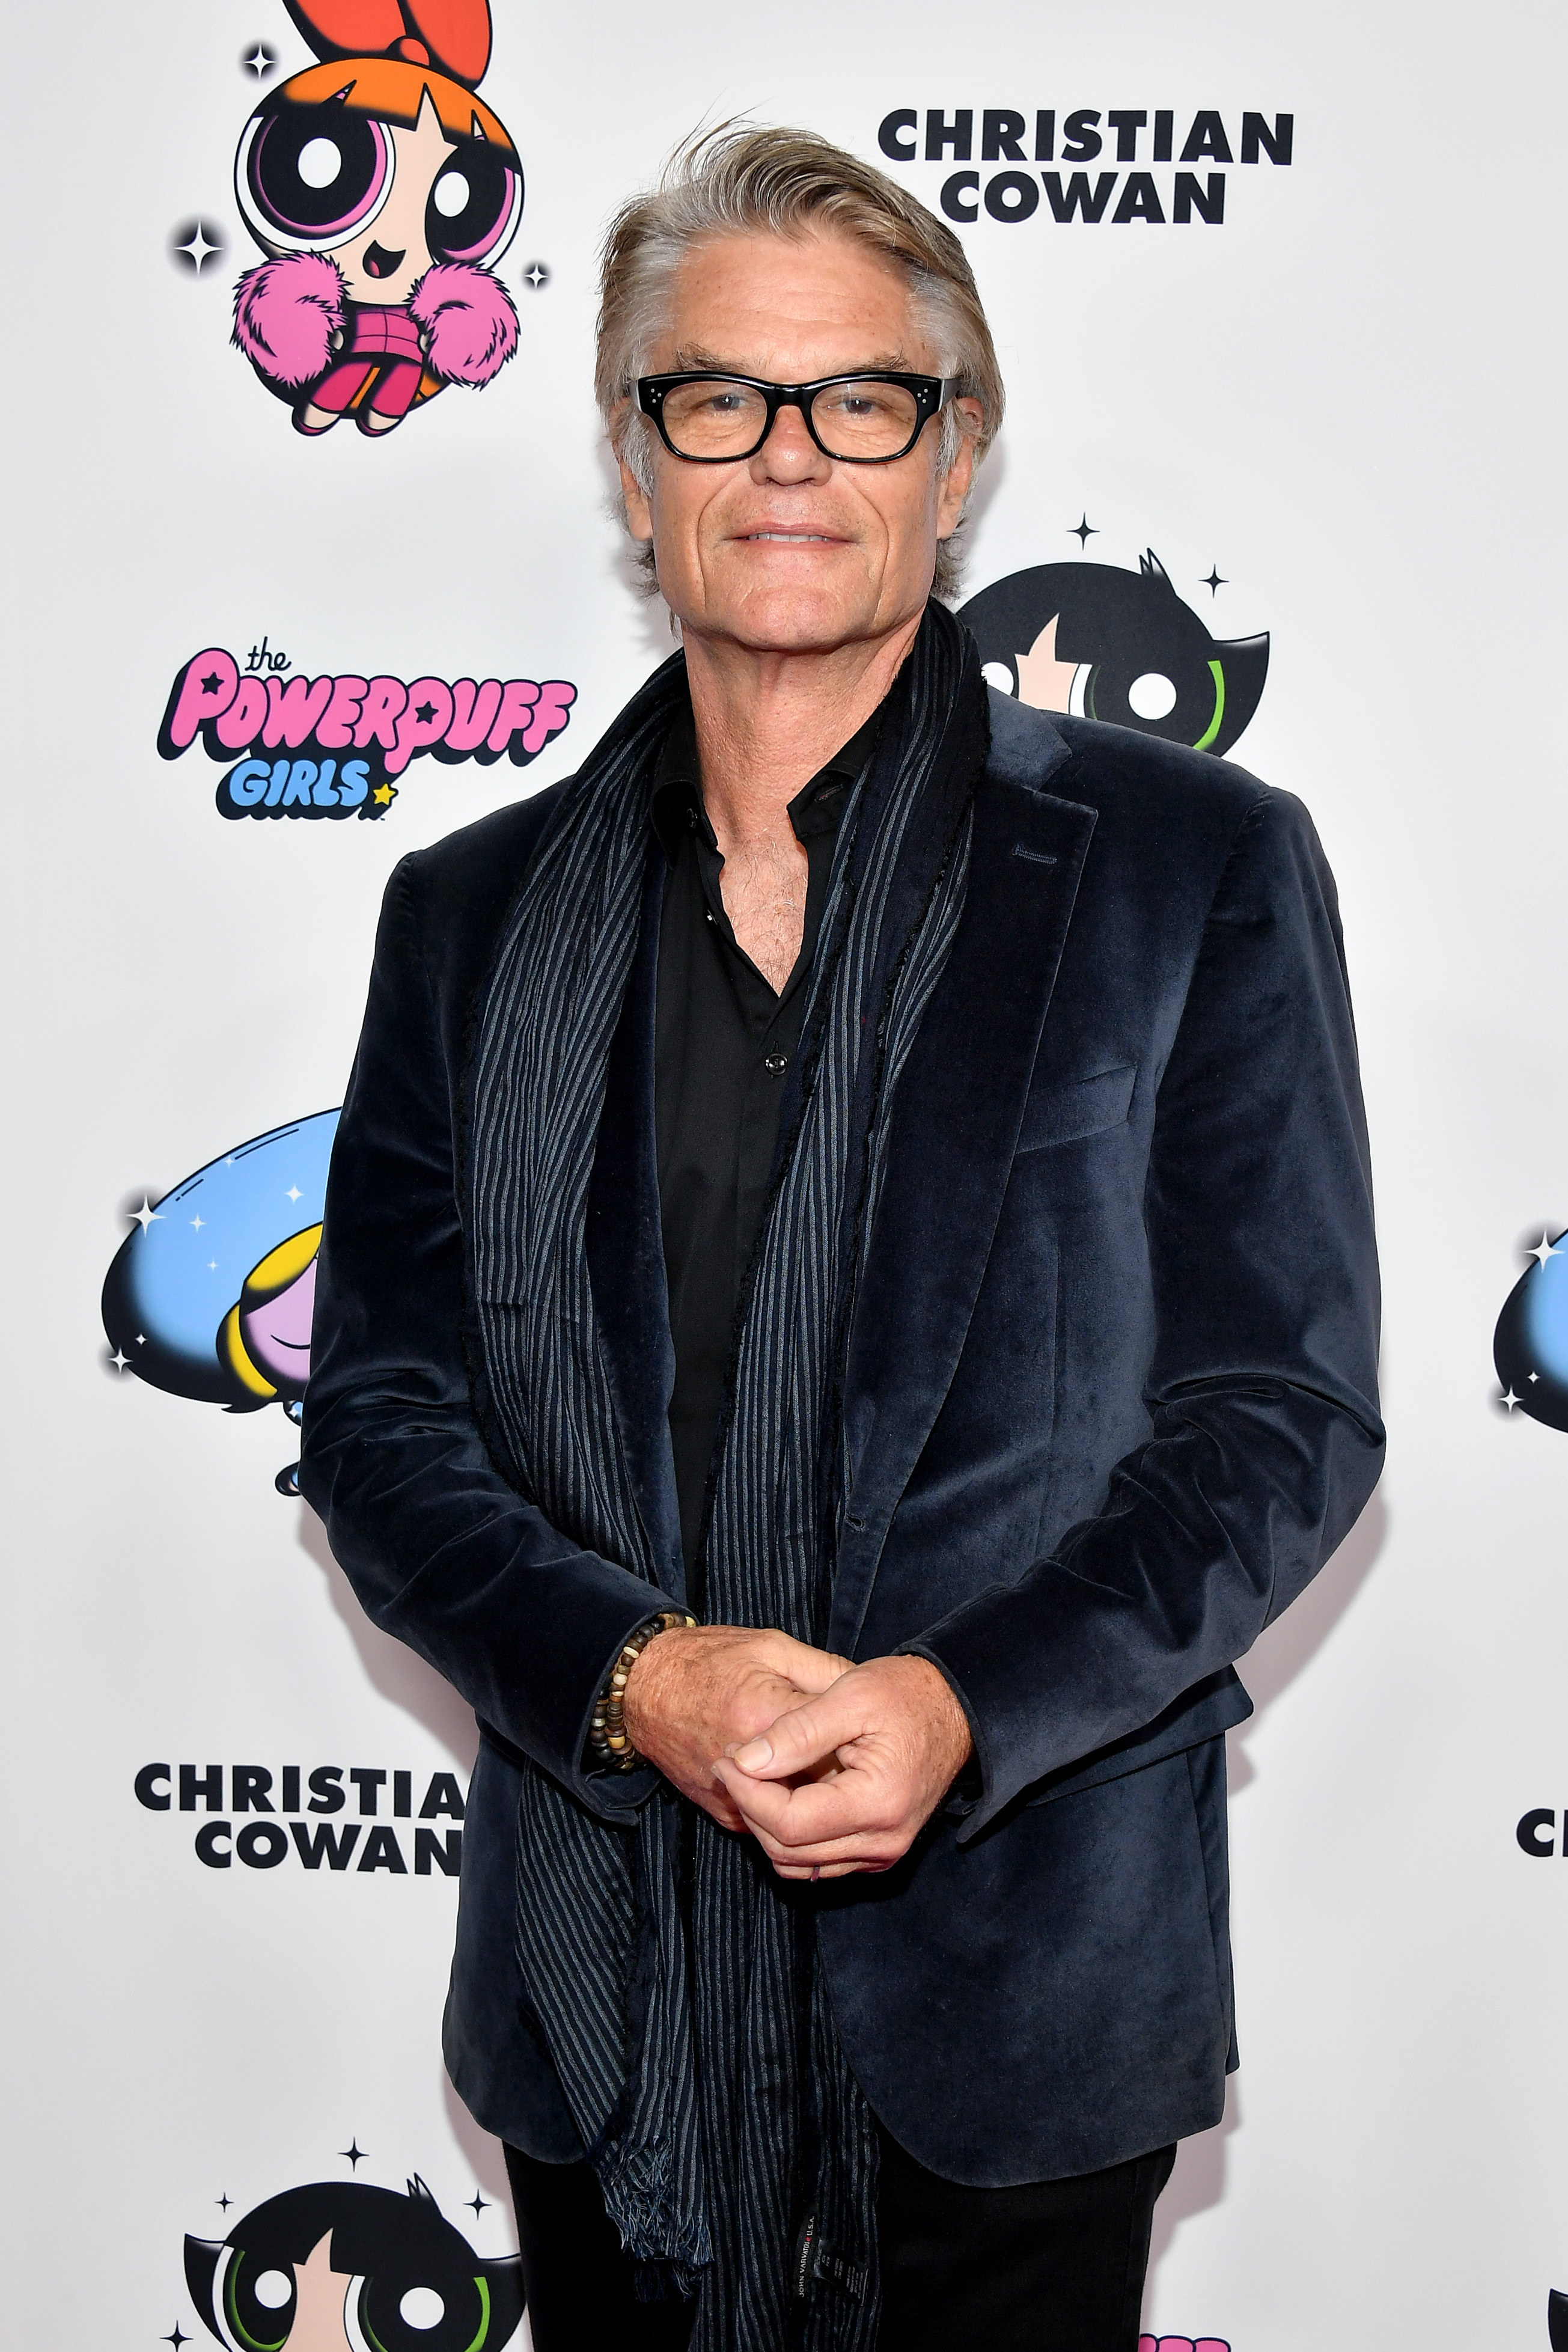 Harry Hamlin attends the 2020 Christian Cowan x Powerpuff Girls Runway Show on March 08, 2020 in Hollywood, California